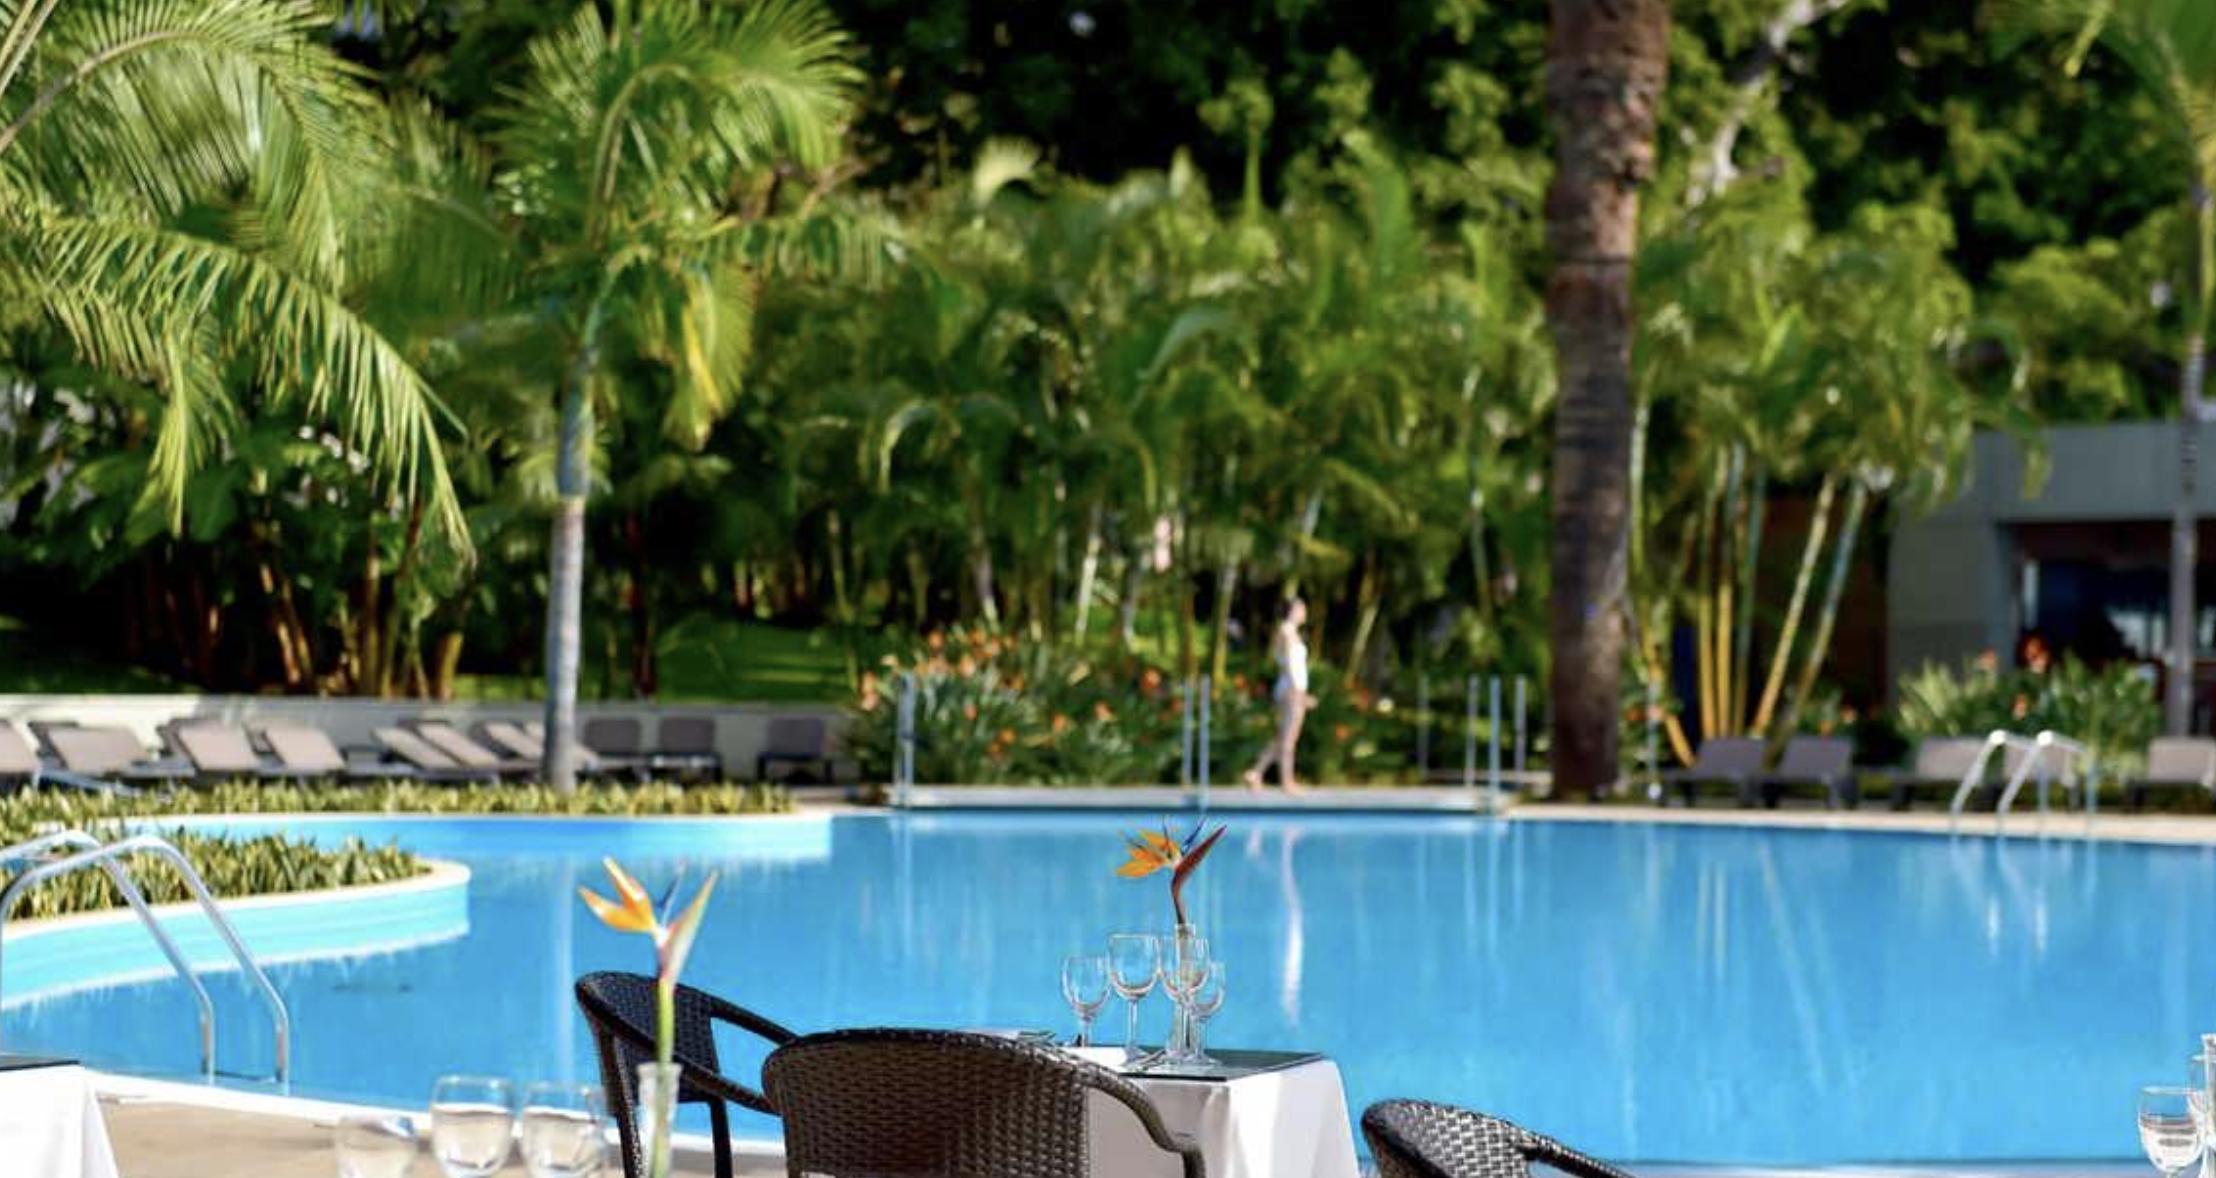 6 Hoteles Con Piscina En Portugal